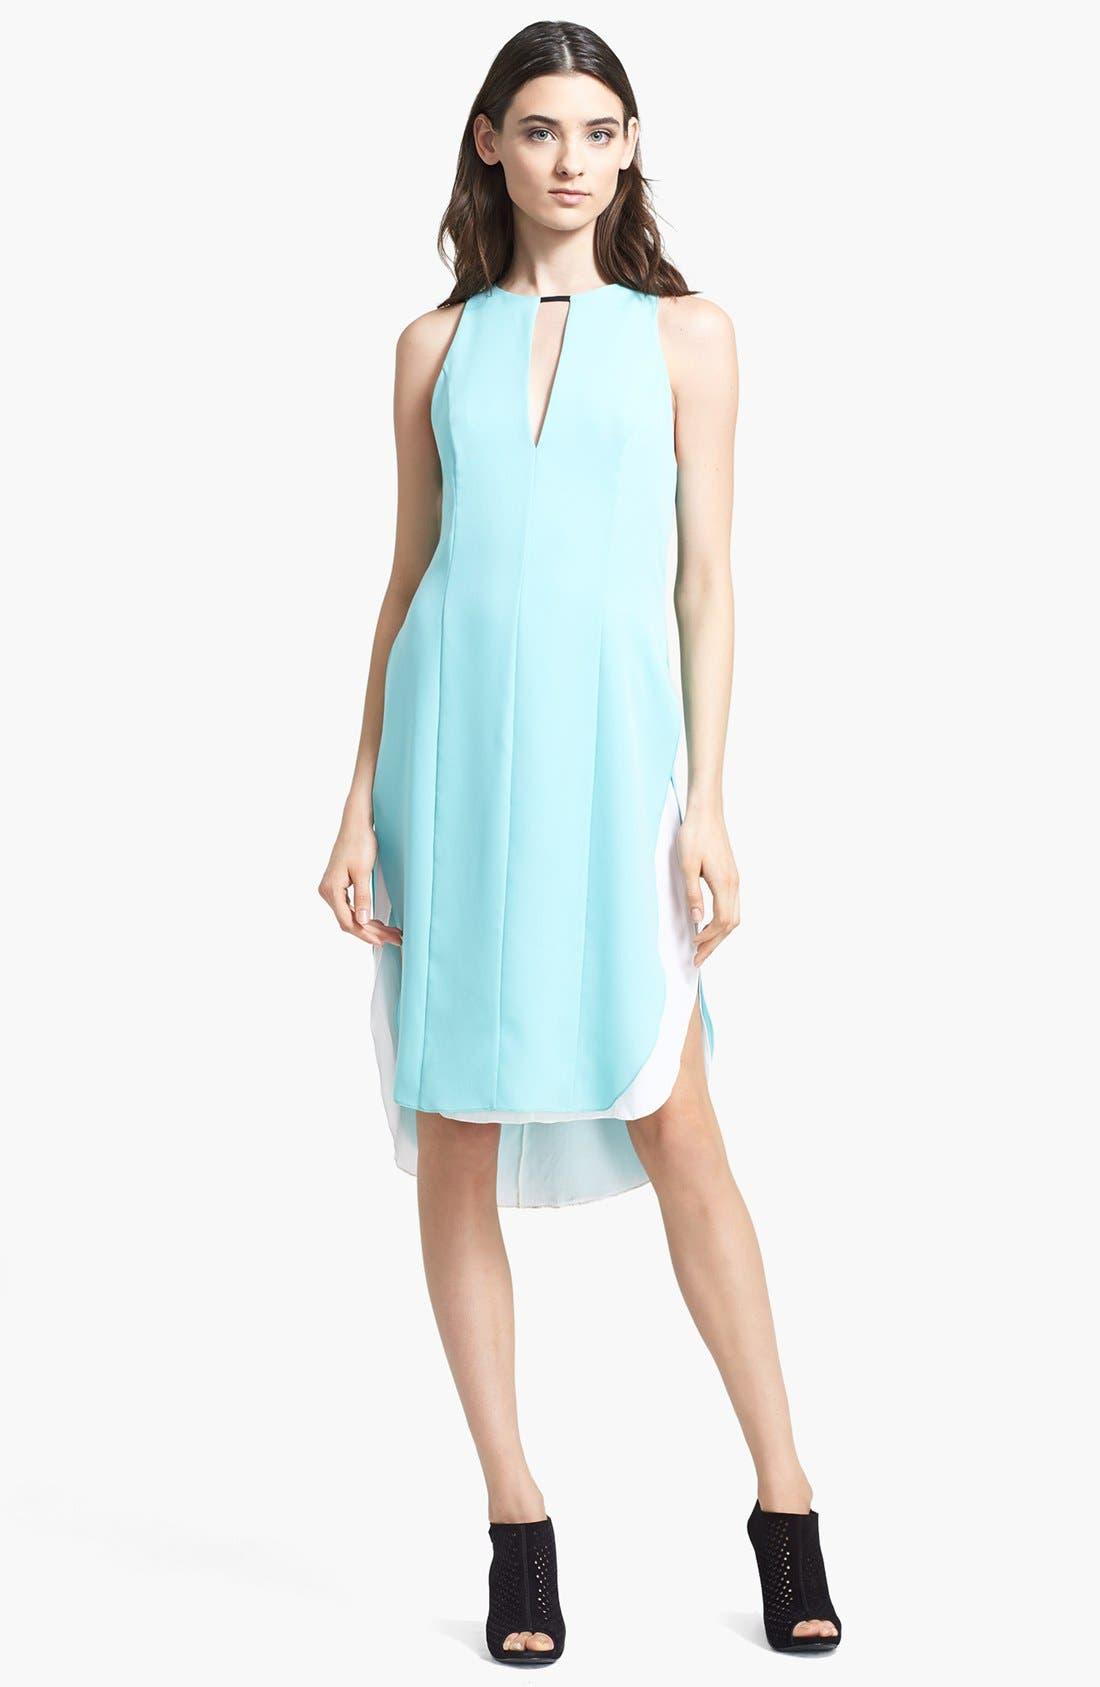 Alternate Image 1 Selected - rag & bone 'Alyna' High/Low Dress